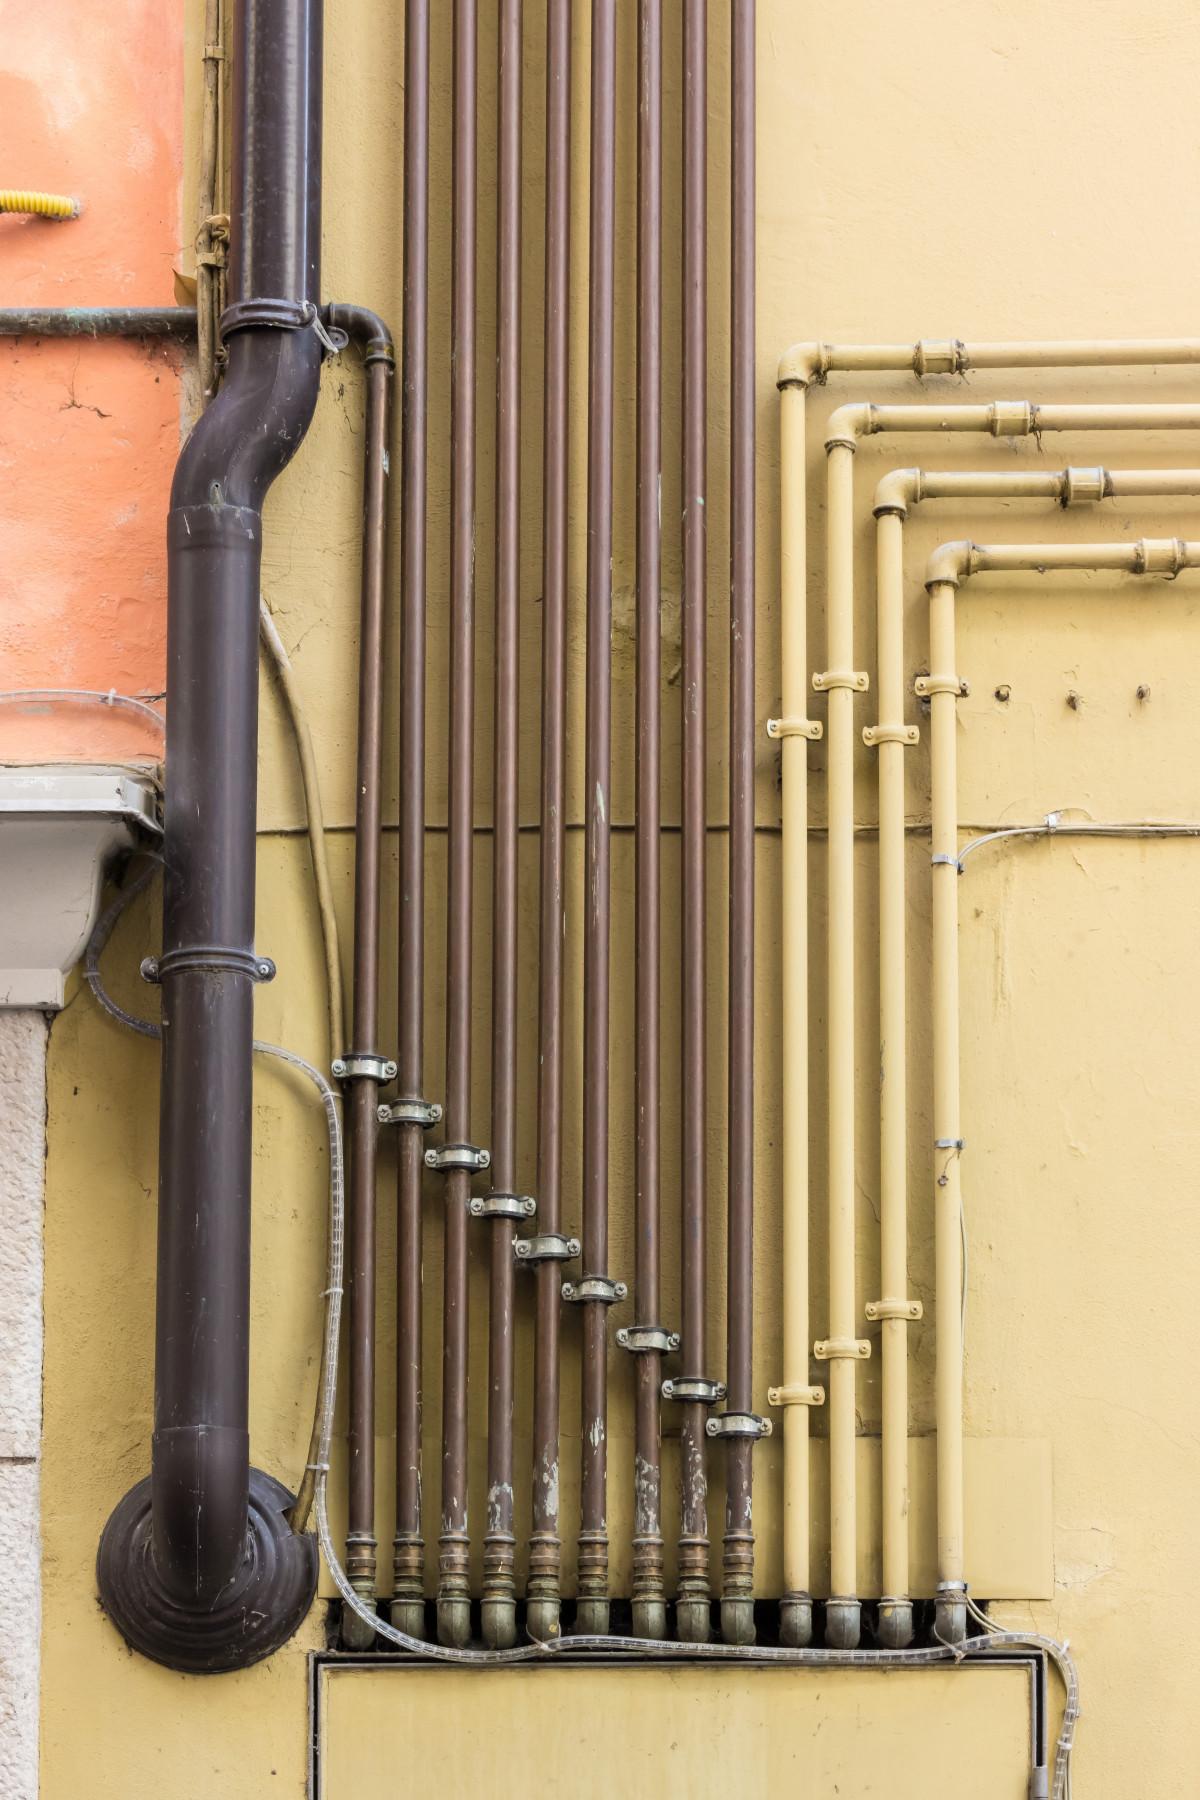 kostenlose foto : struktur, muster, säule, metall, musikinstrument